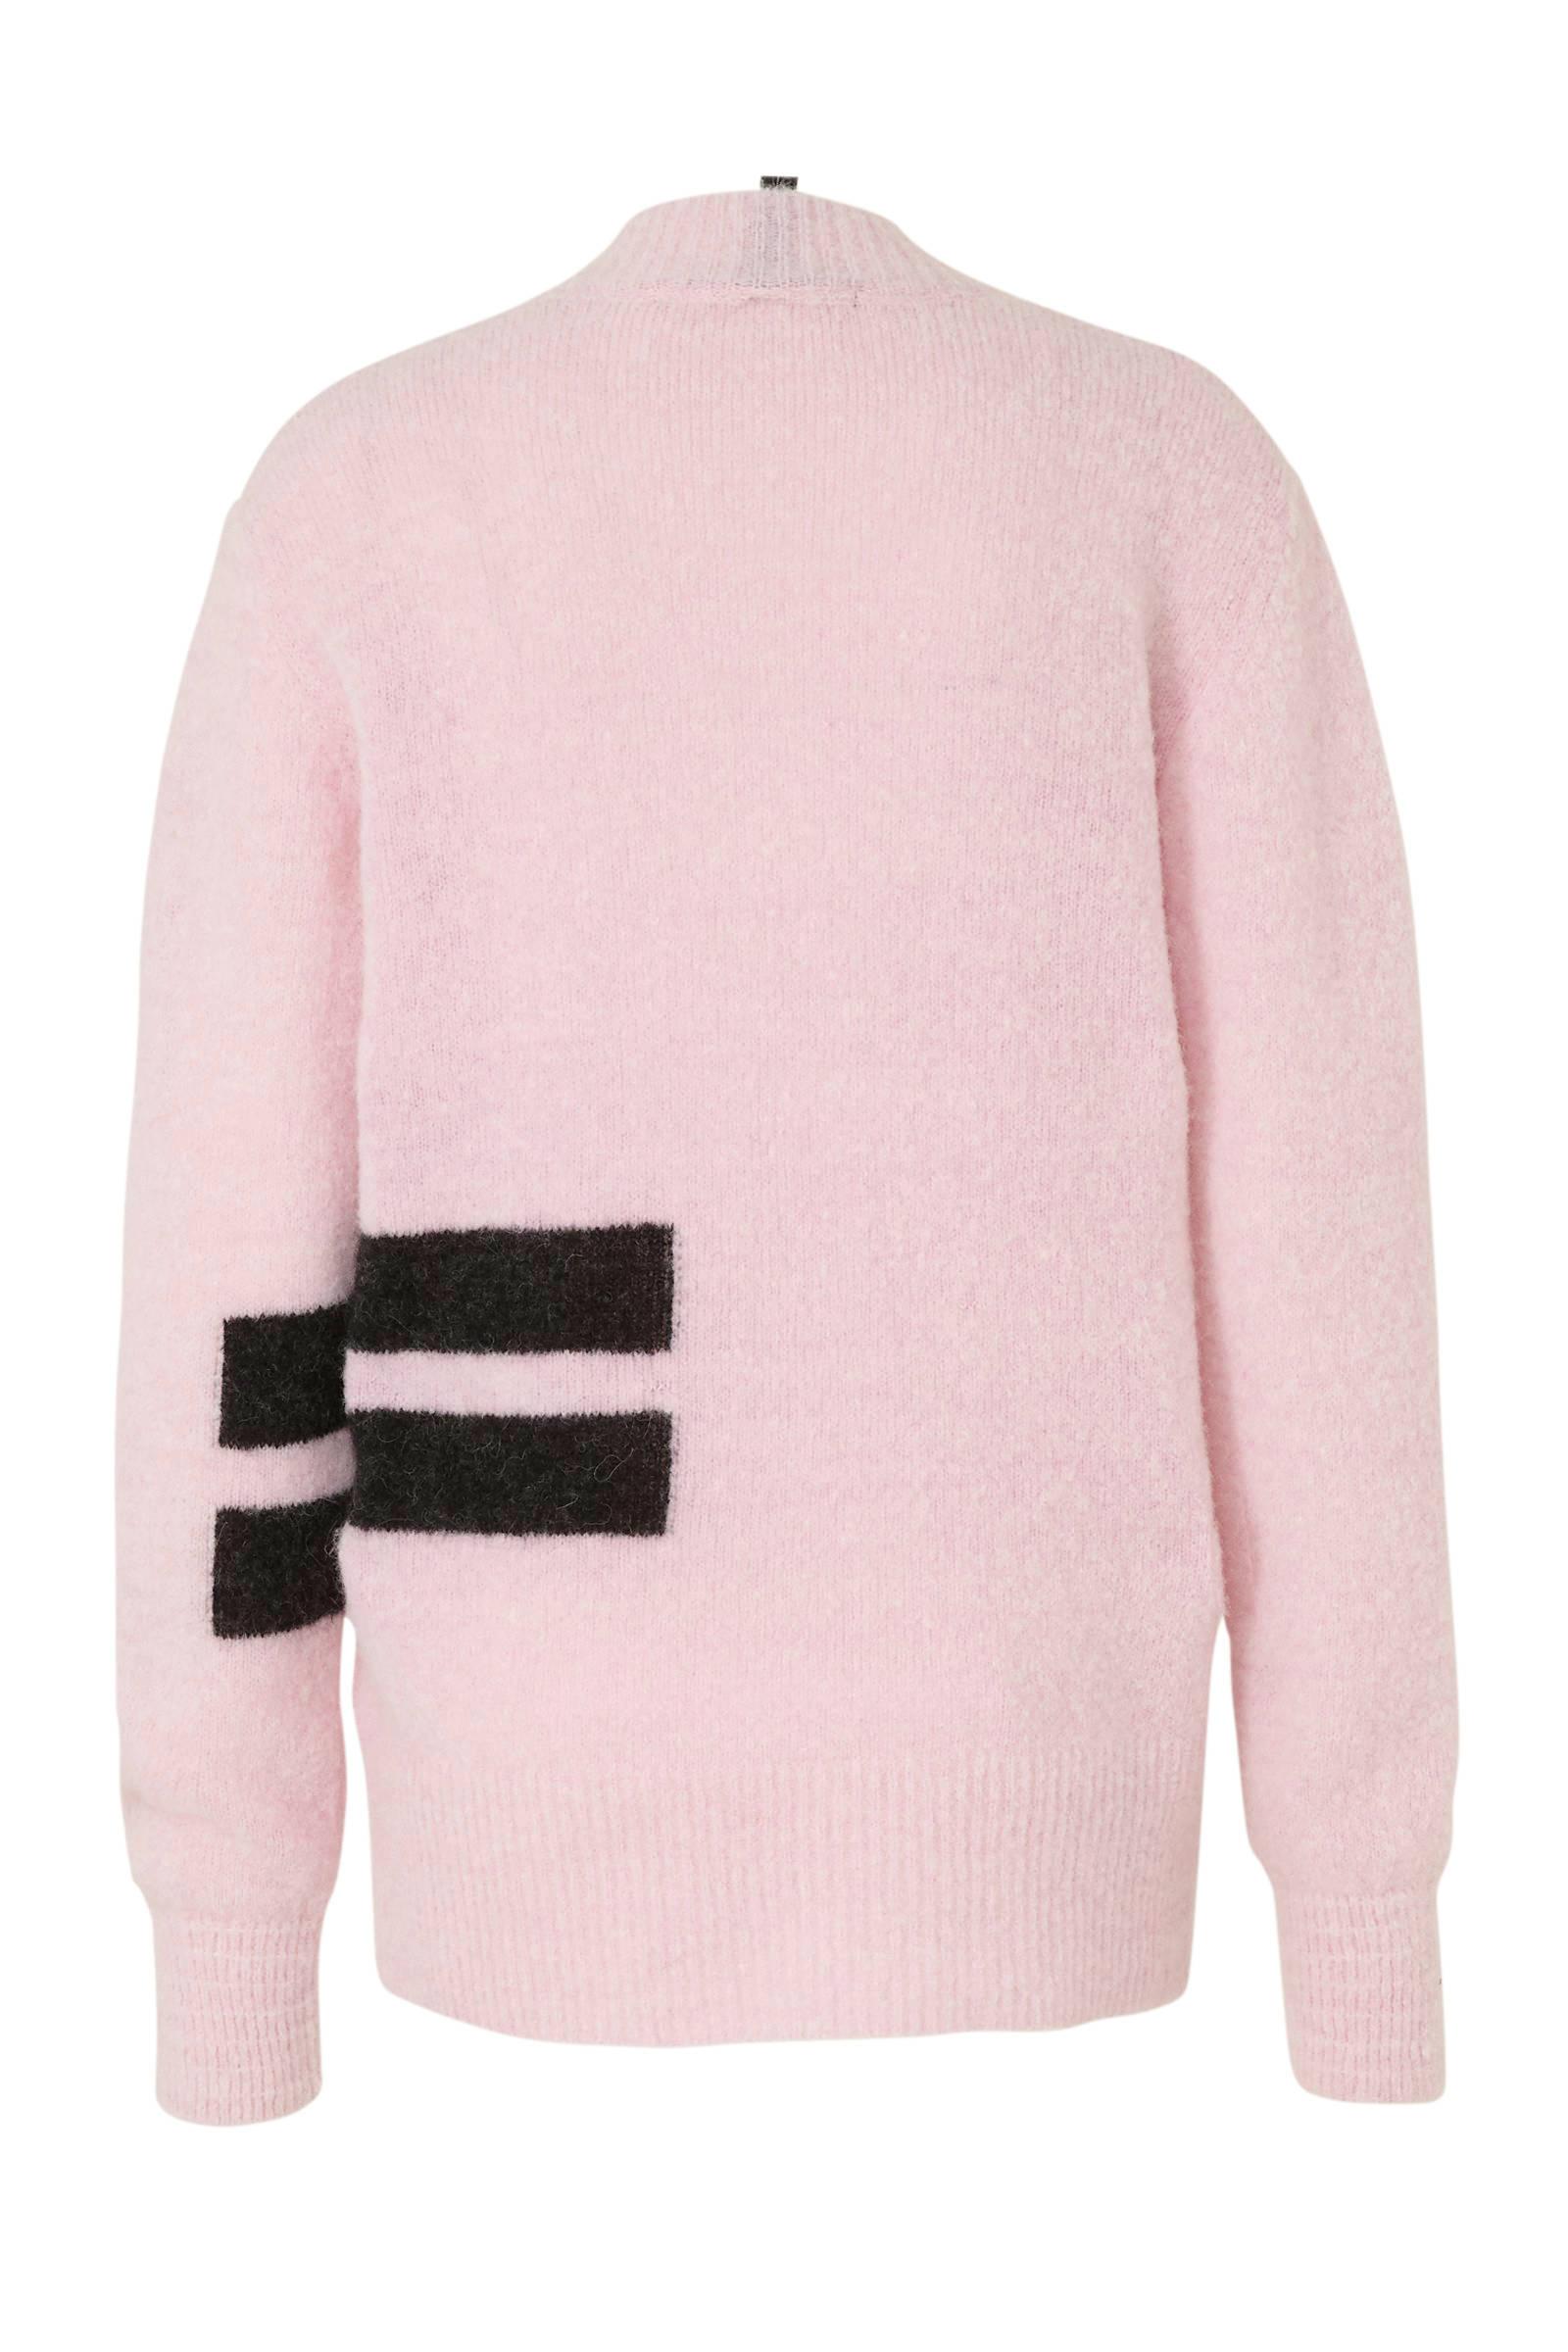 10DAYS gebreide trui met wol lichtroze